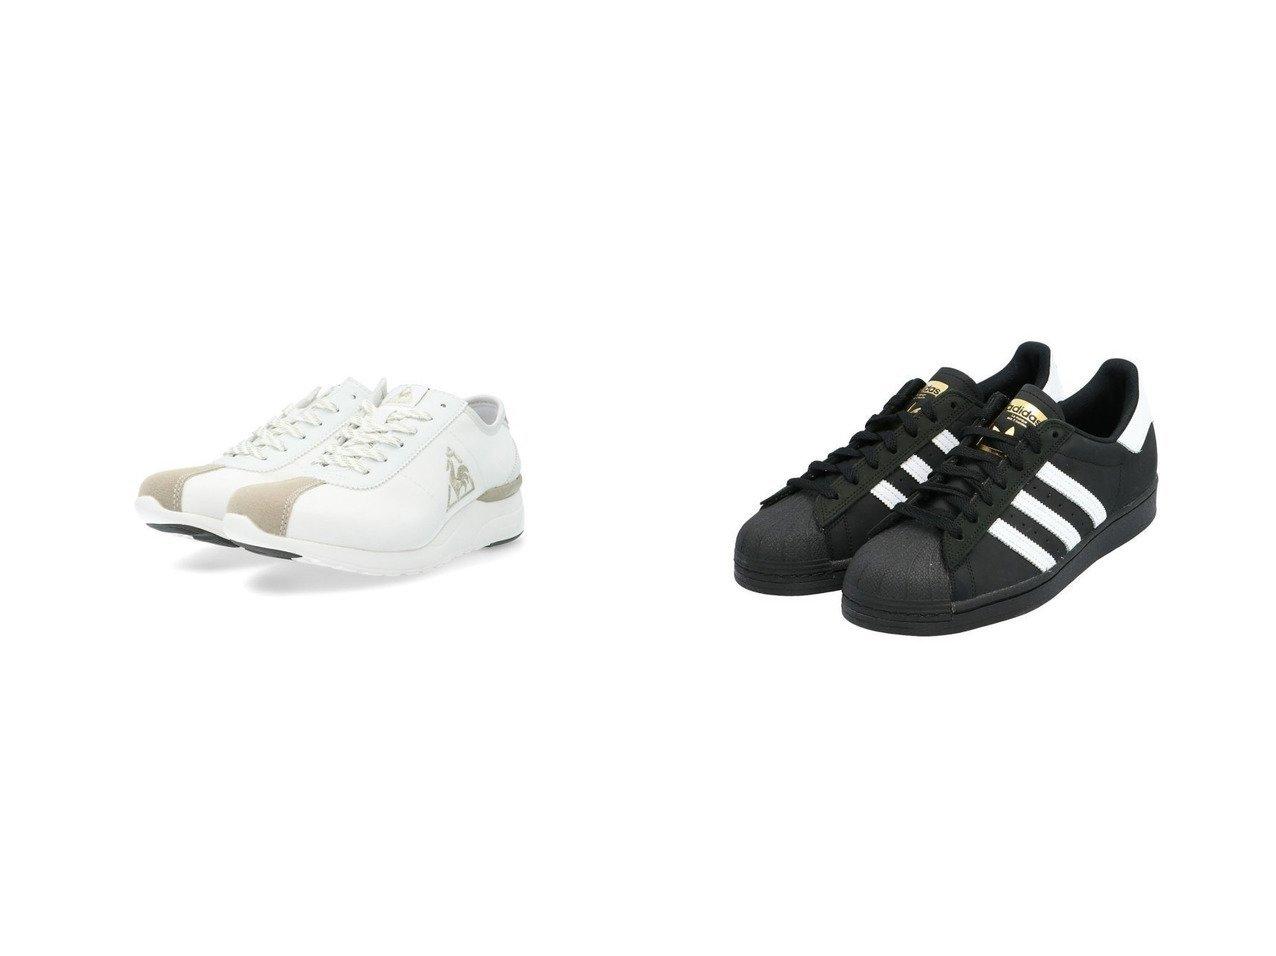 【adidas Originals/アディダス オリジナルス】の【アディダス スケートボーディング】スーパースター Superstar FV0321&【le coq sportif/ルコックスポルティフ】のヒールアップスニーカー 【シューズ・靴】おすすめ!人気、トレンド・レディースファッションの通販 おすすめで人気の流行・トレンド、ファッションの通販商品 メンズファッション・キッズファッション・インテリア・家具・レディースファッション・服の通販 founy(ファニー) https://founy.com/ ファッション Fashion レディースファッション WOMEN シューズ スニーカー スリッポン 人気 今季 インソール フェミニン 軽量 |ID:crp329100000038587